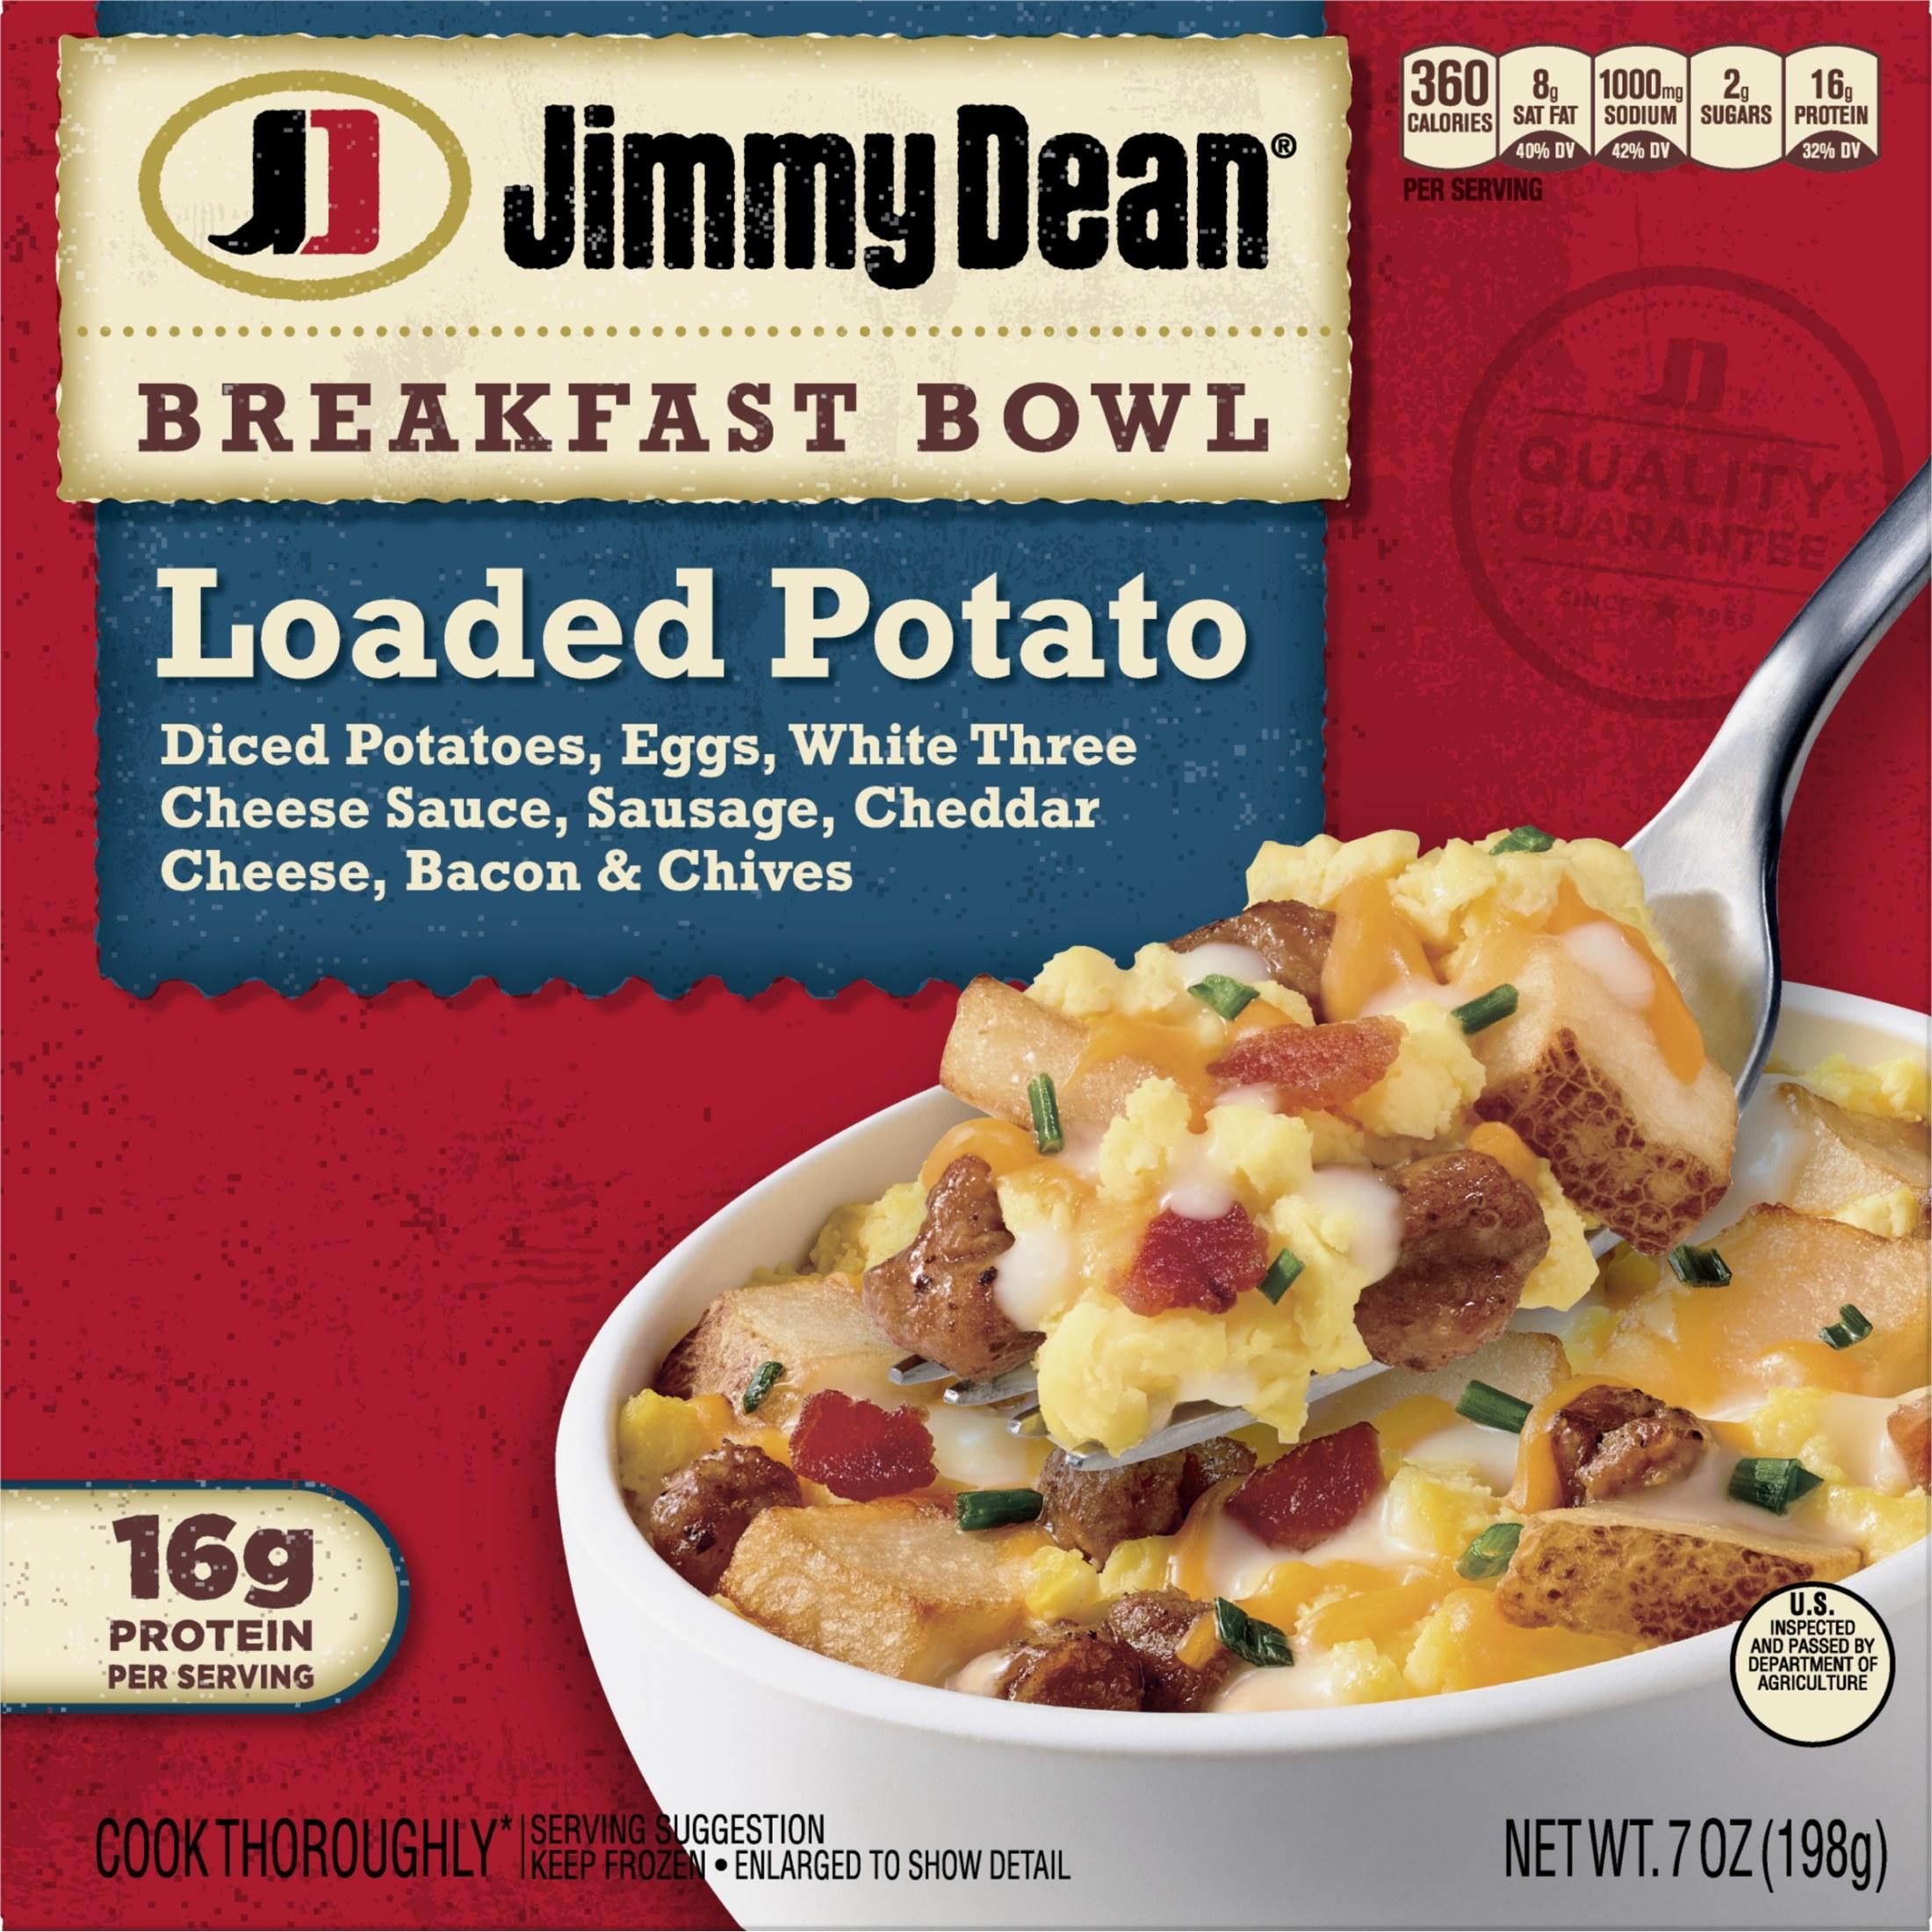 Jimmy Dean loaded potato bowl packaging showing potato bowl with potato, sausage & cheese